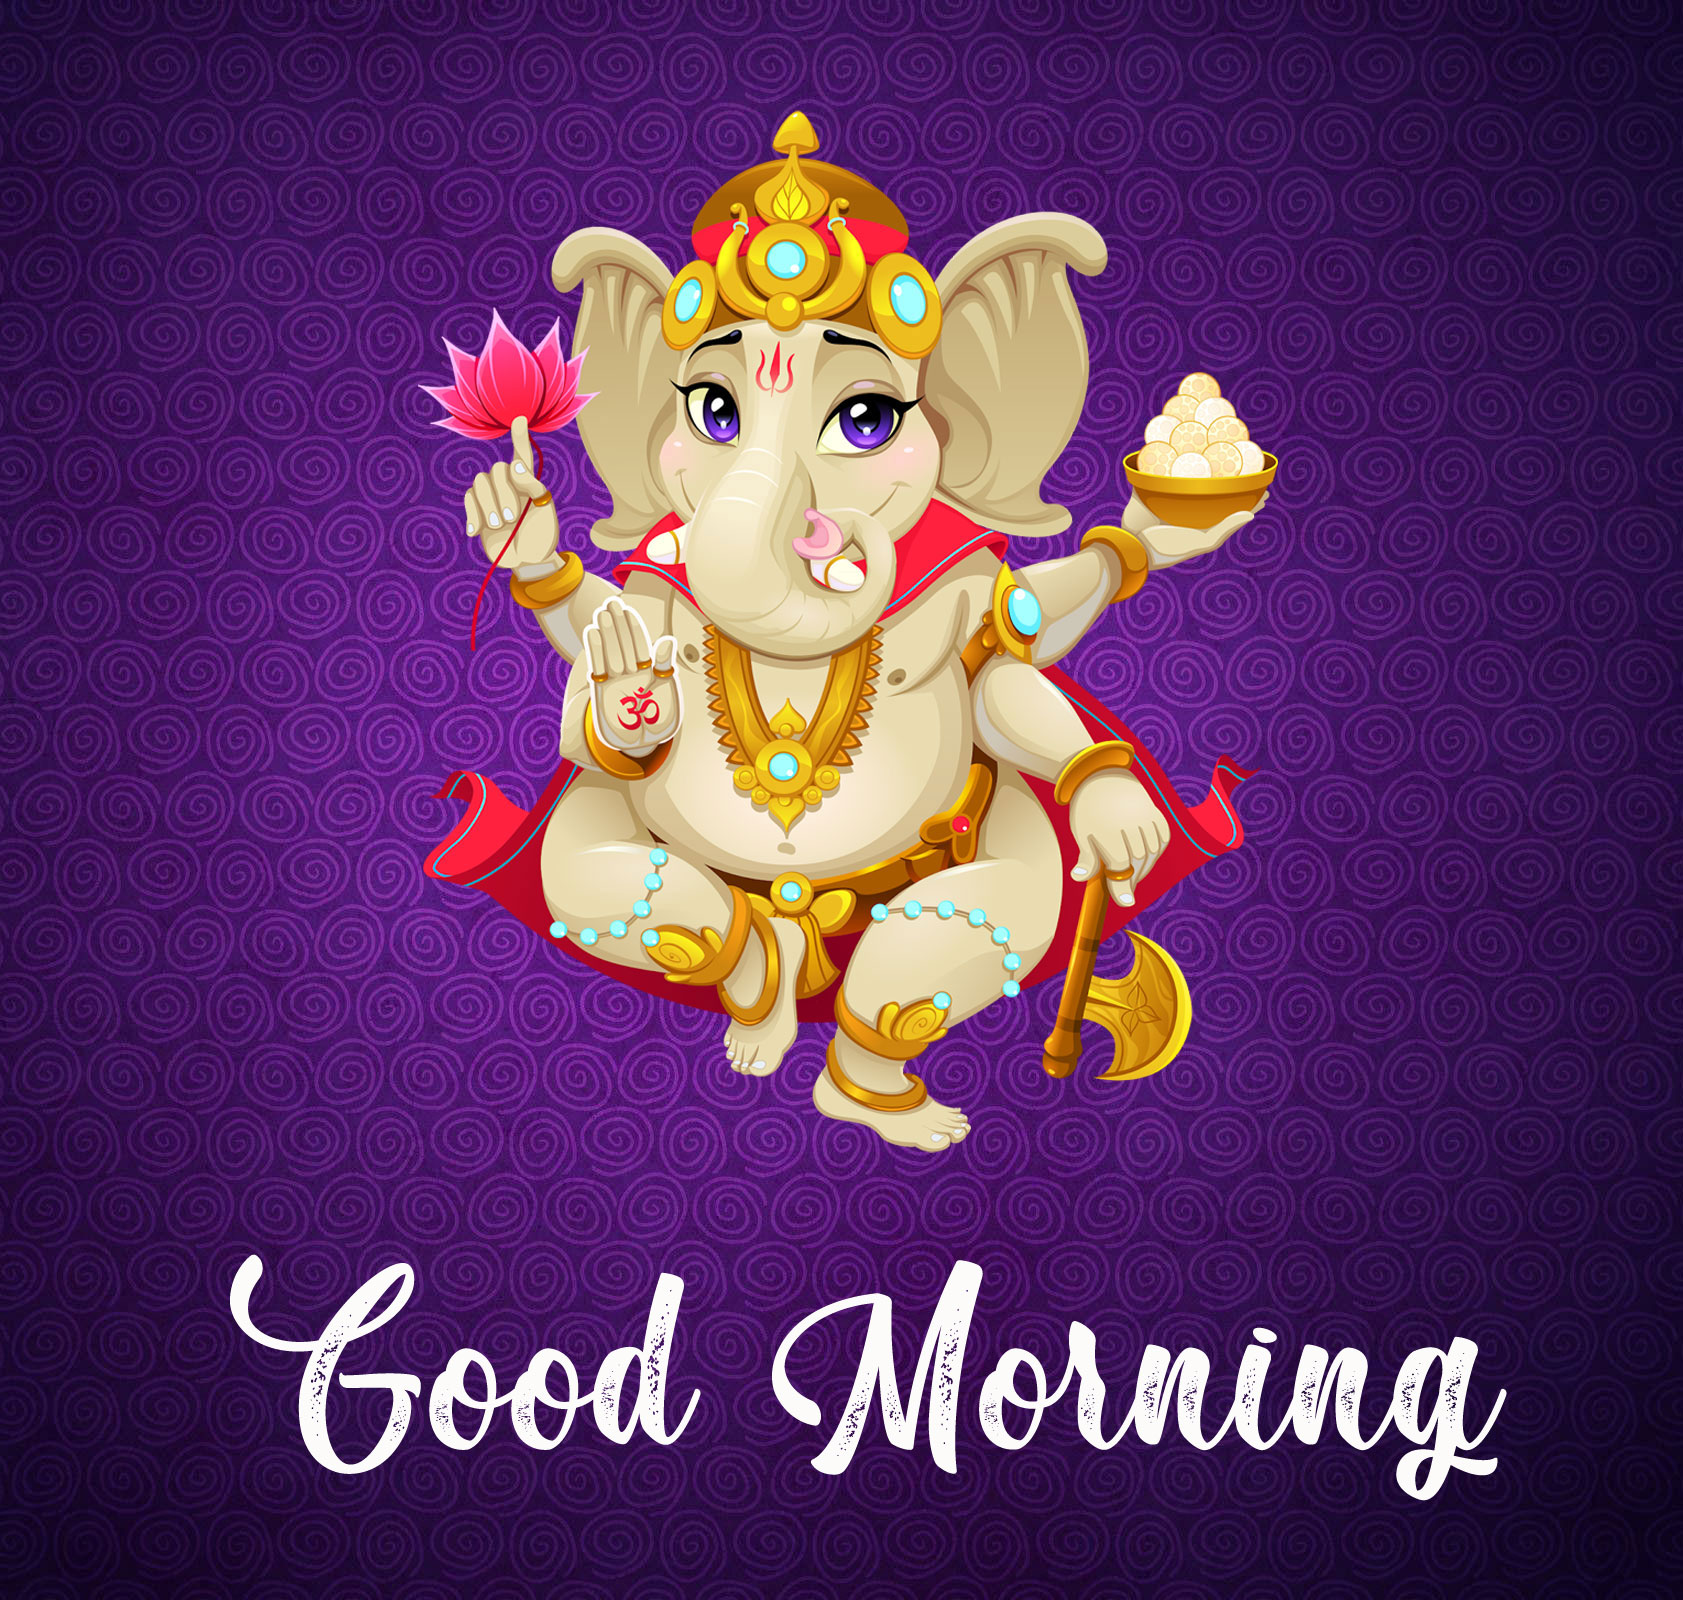 New ganesha good morning images photo pics